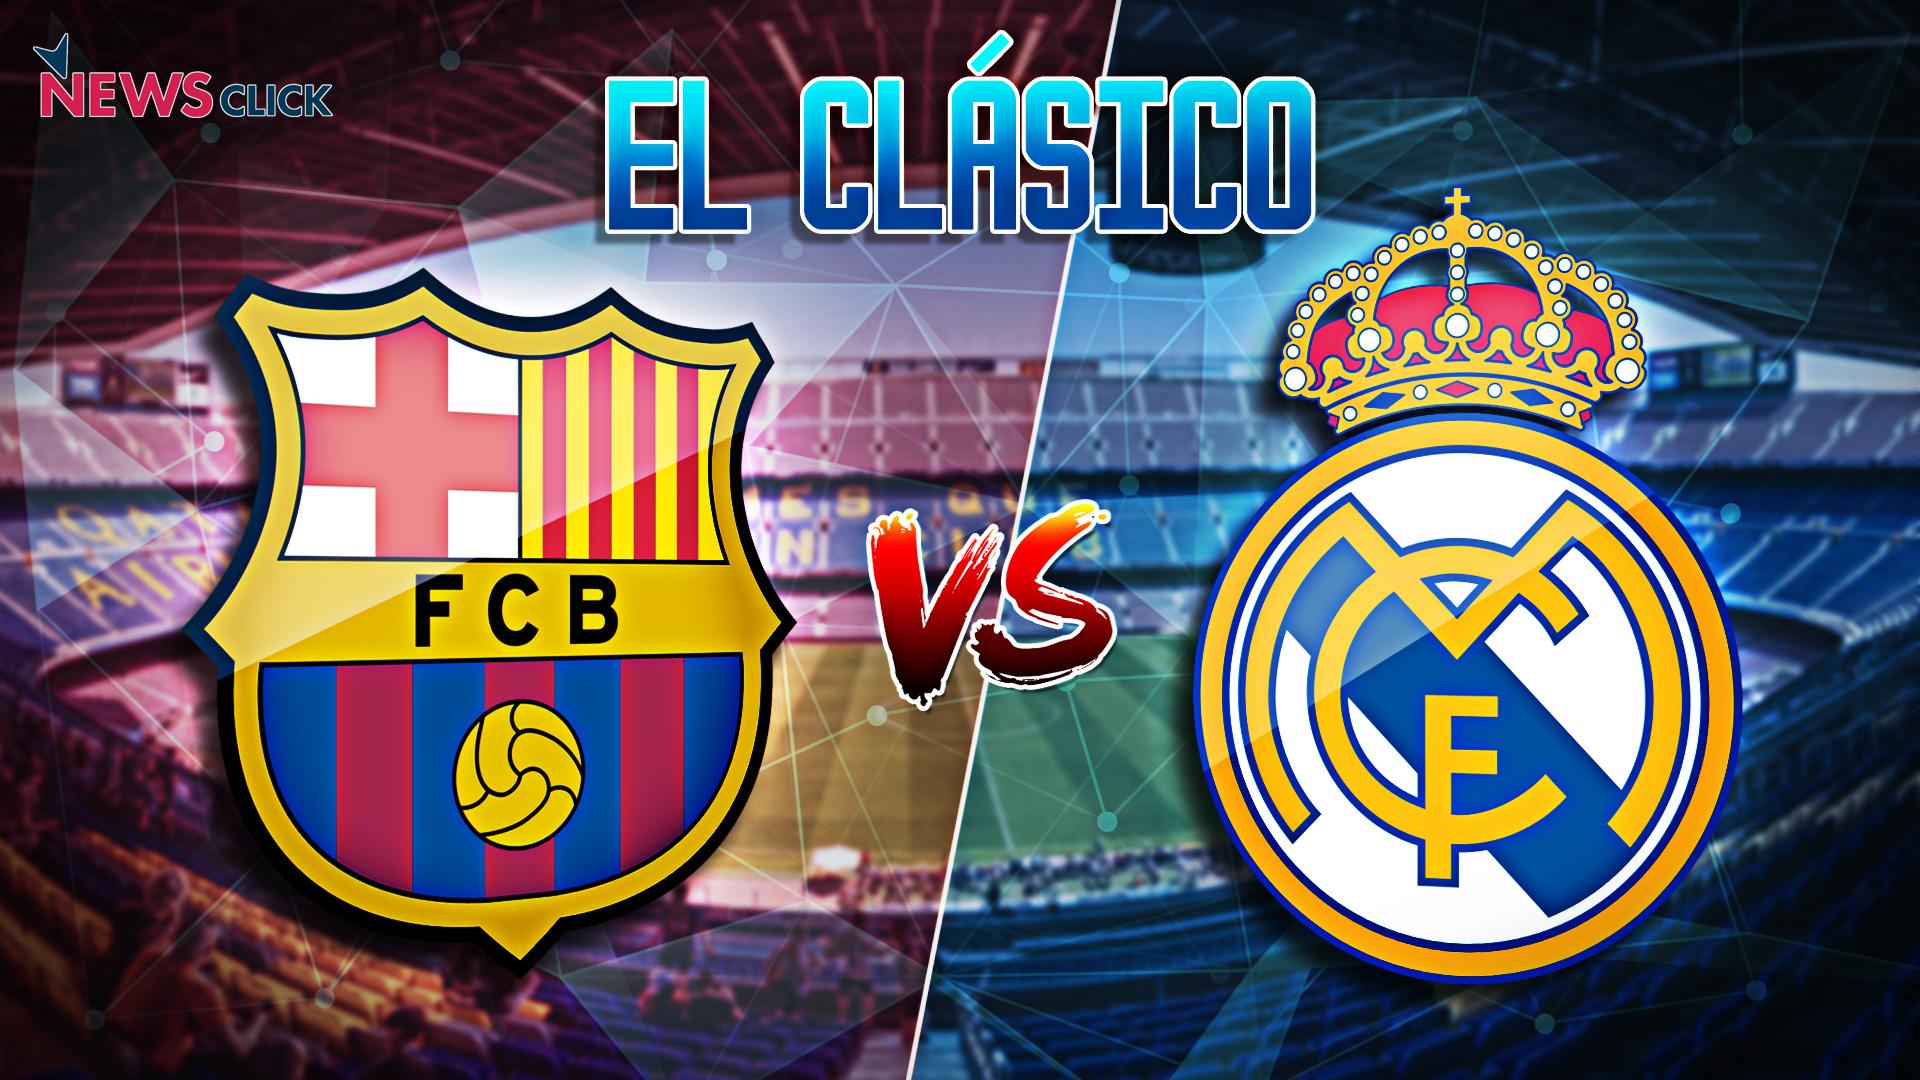 Fc Barcelona Vs Real Madrid Spanish Police Arrests 10 For Selling